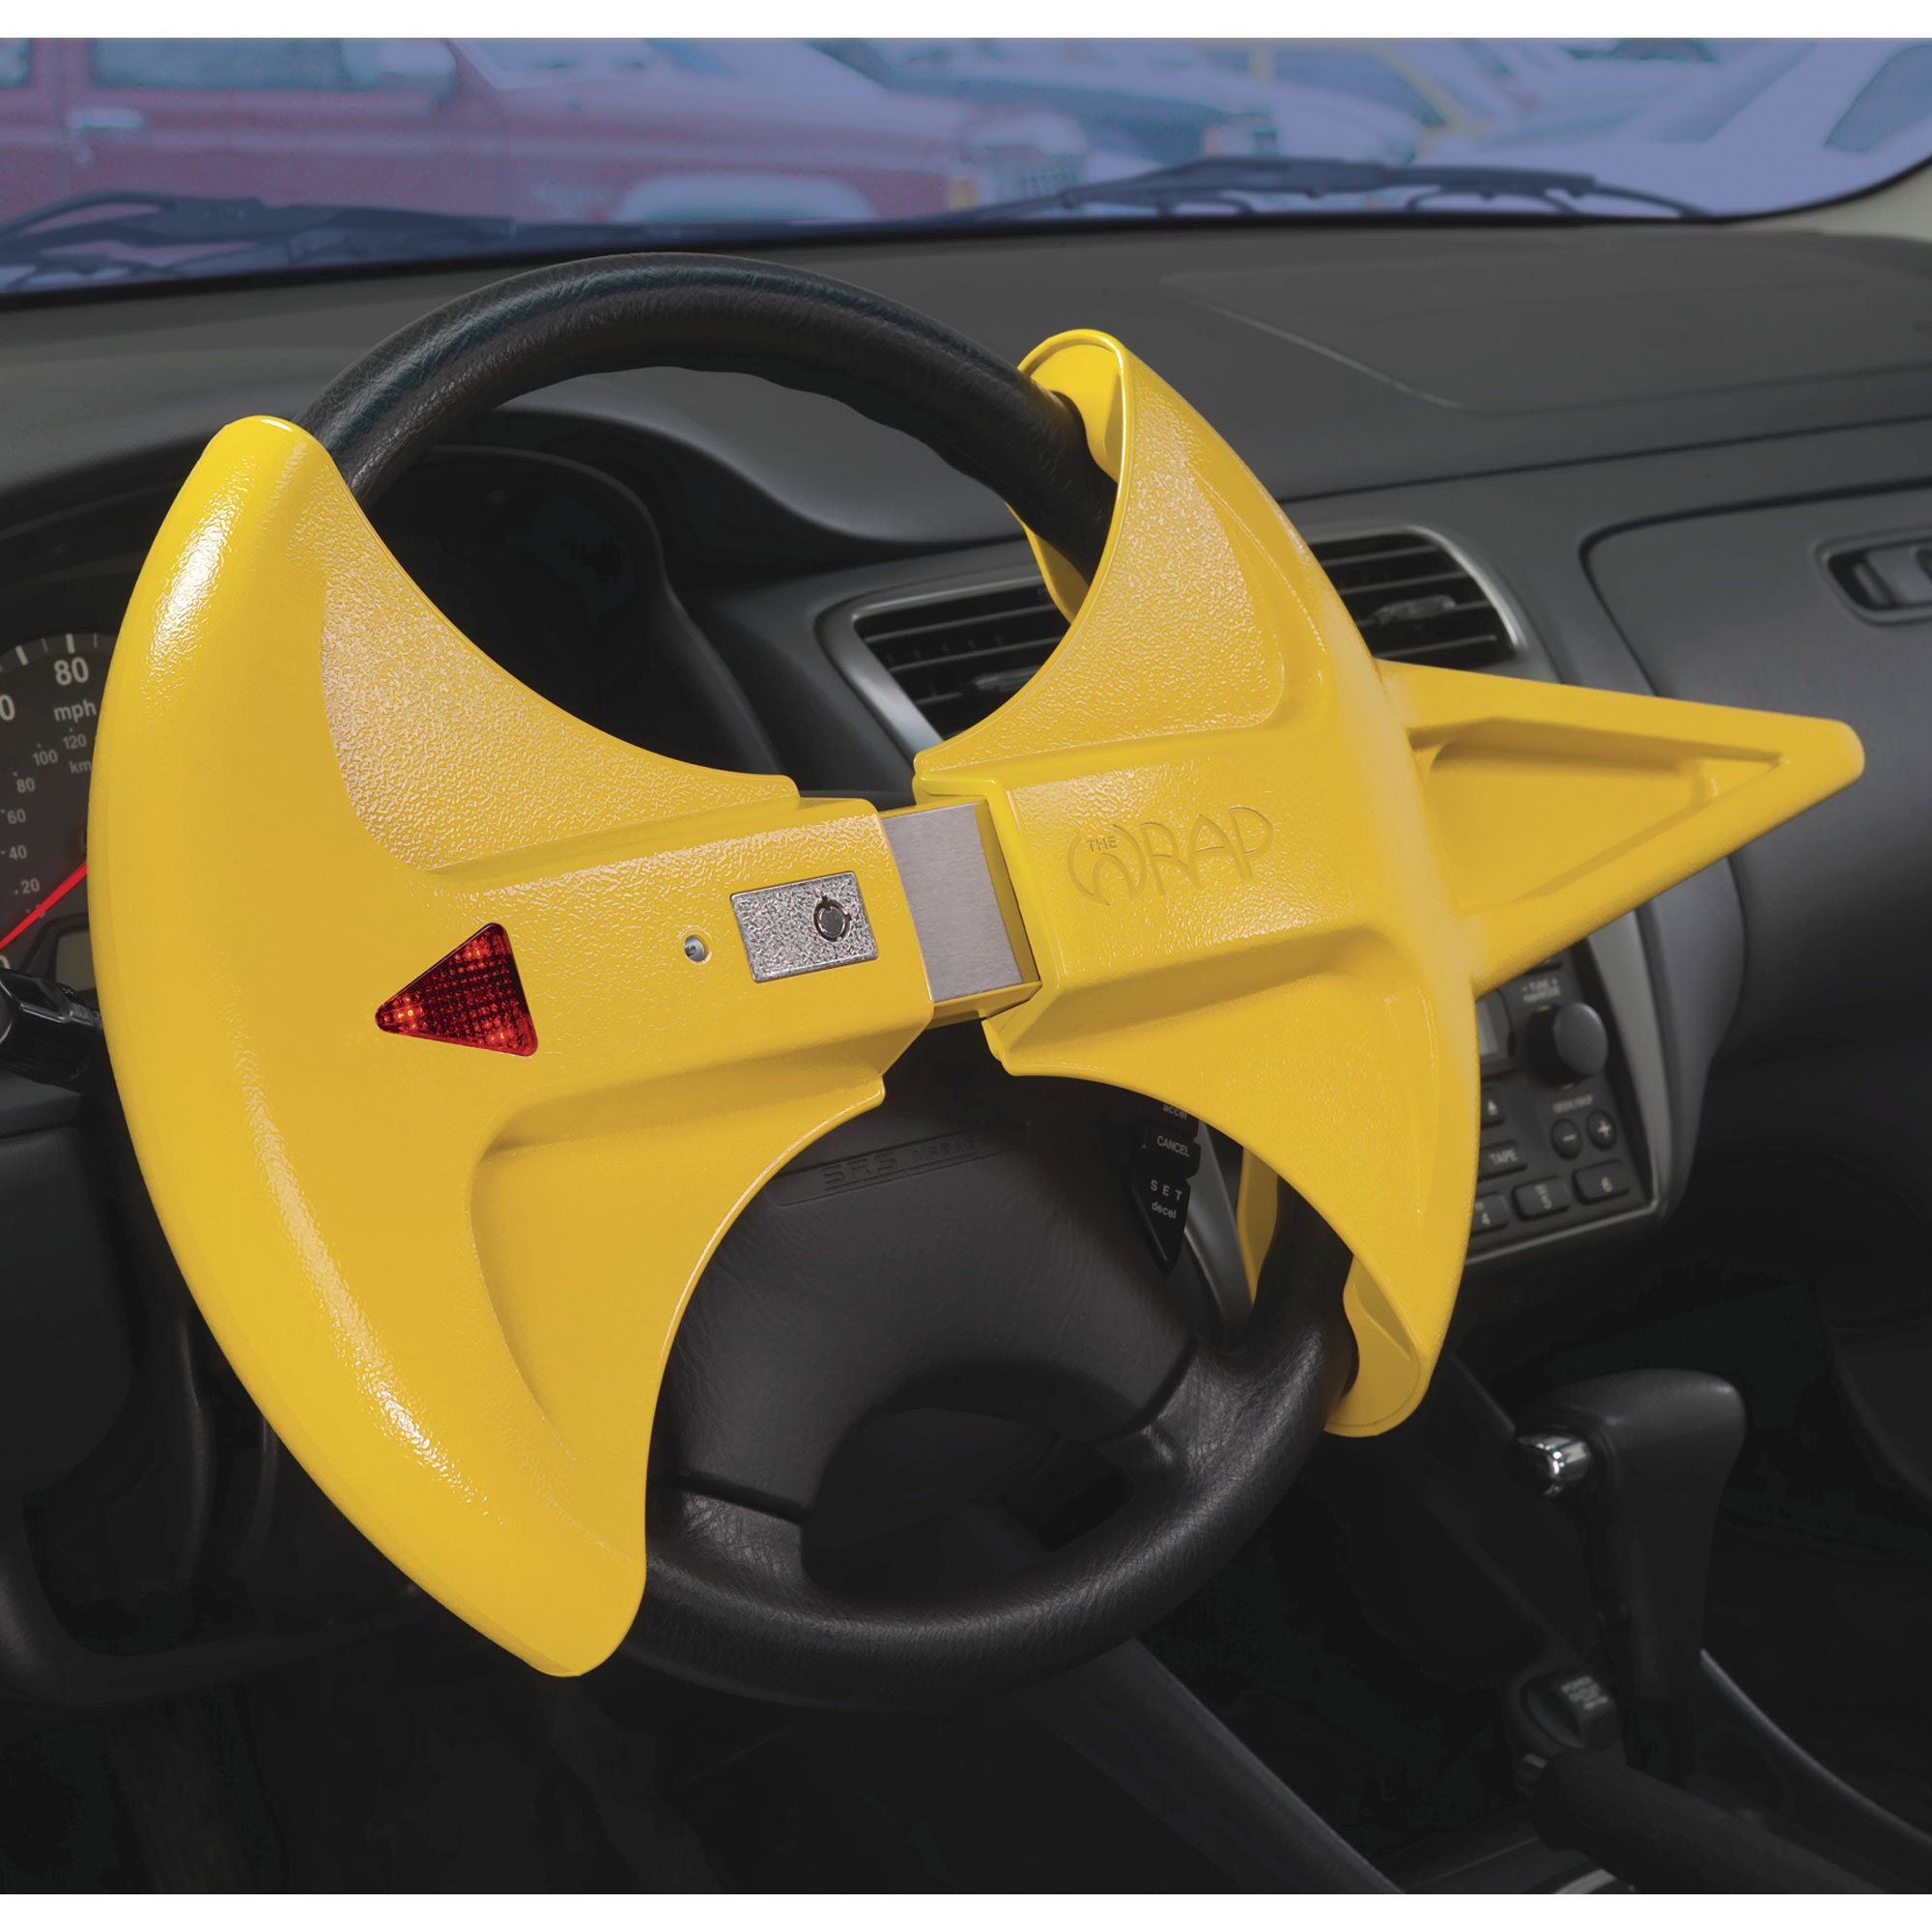 Blockit Wrap Vehicle Theft Steering Wheel Lock with Alarm